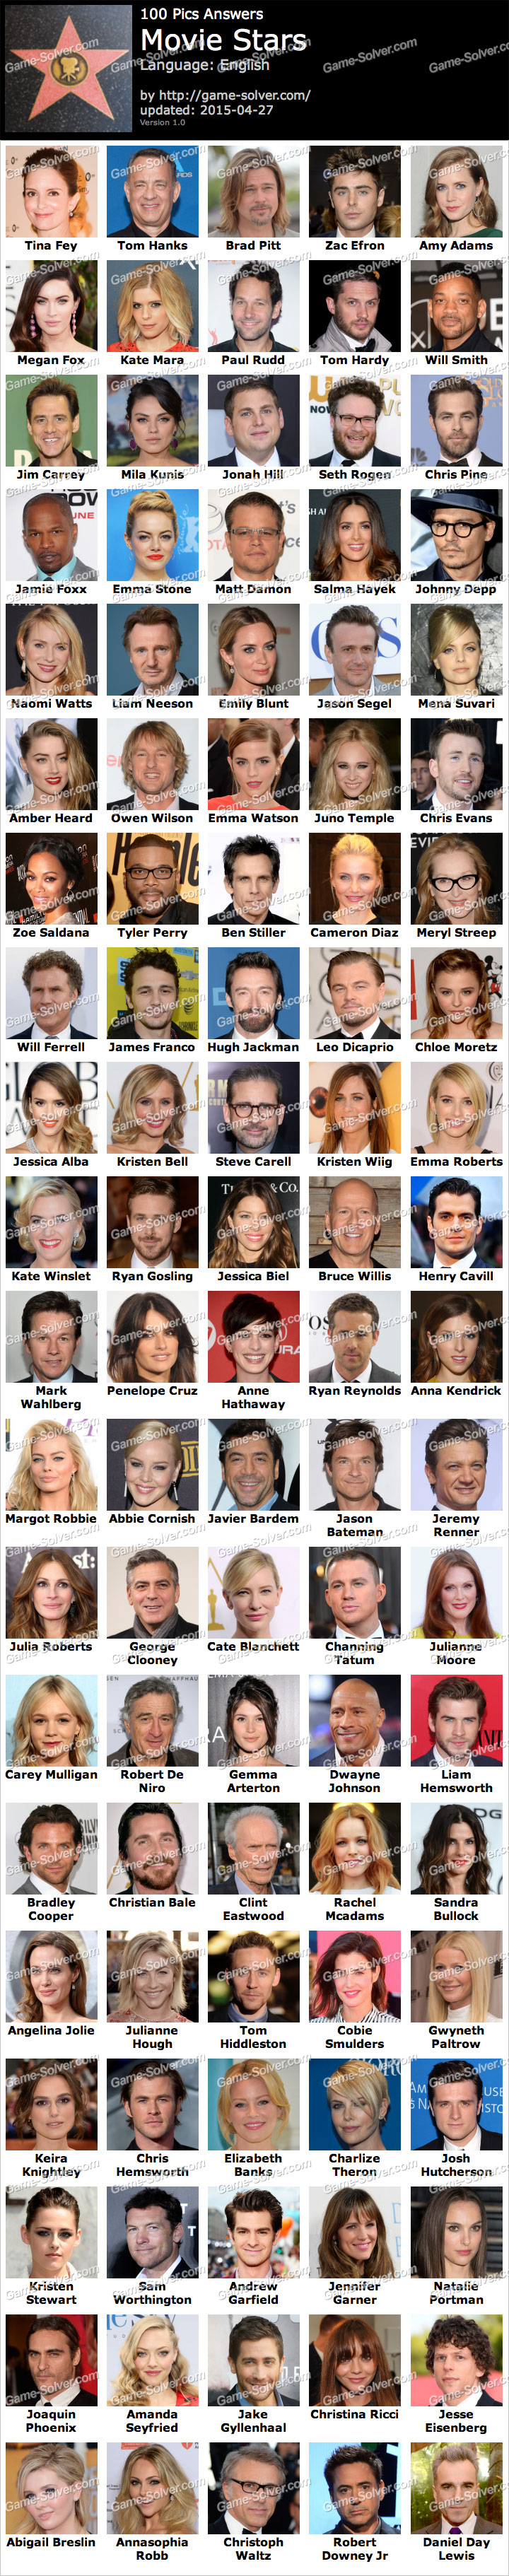 100 Pics Answer Movie Stars